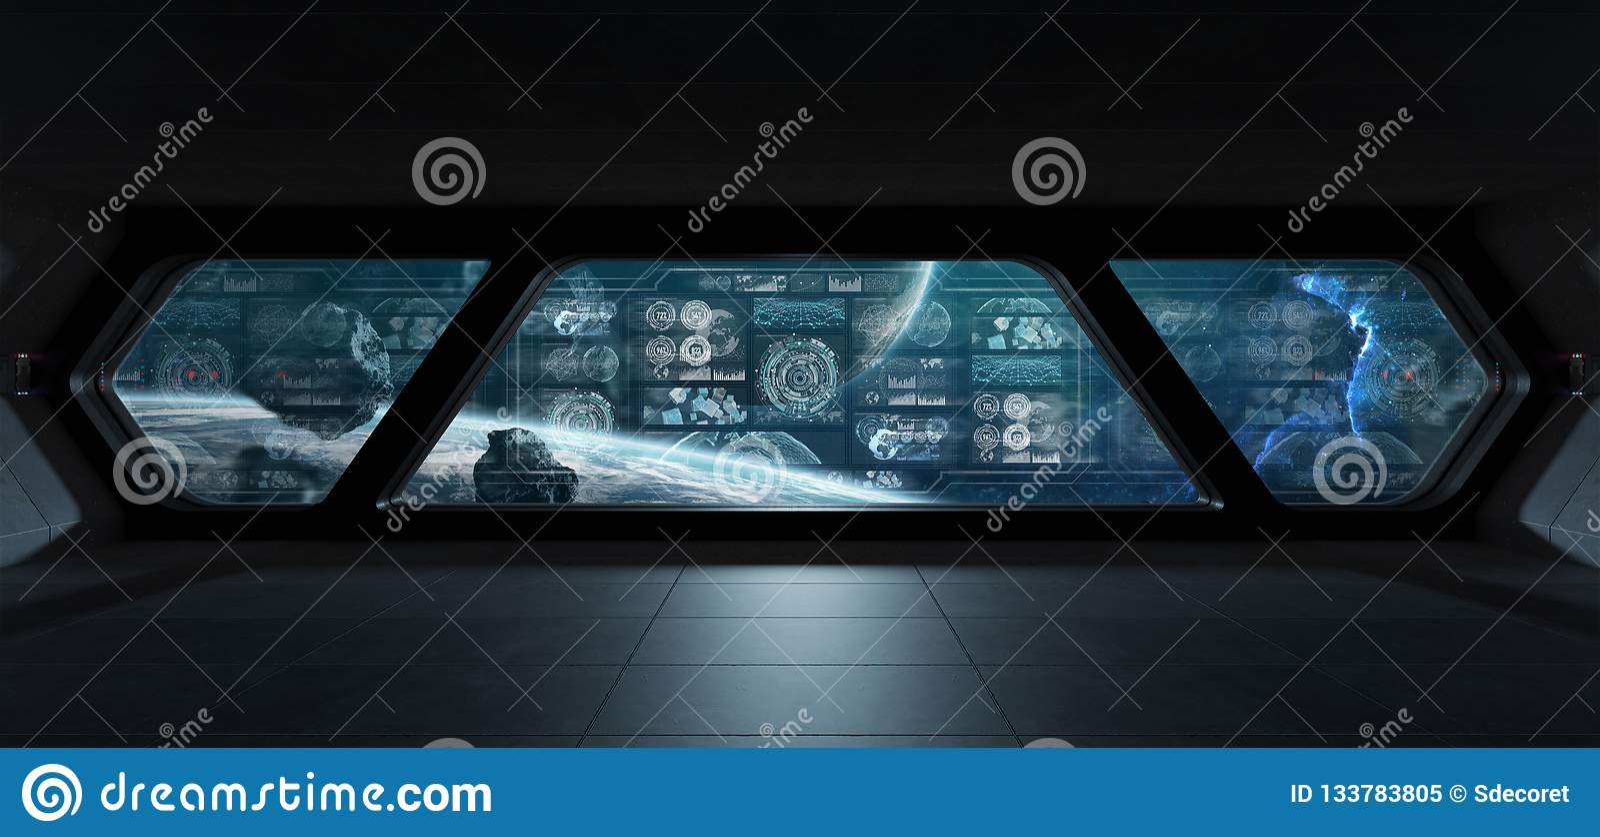 Dark spaceship interior with control panel digital screens 3D re